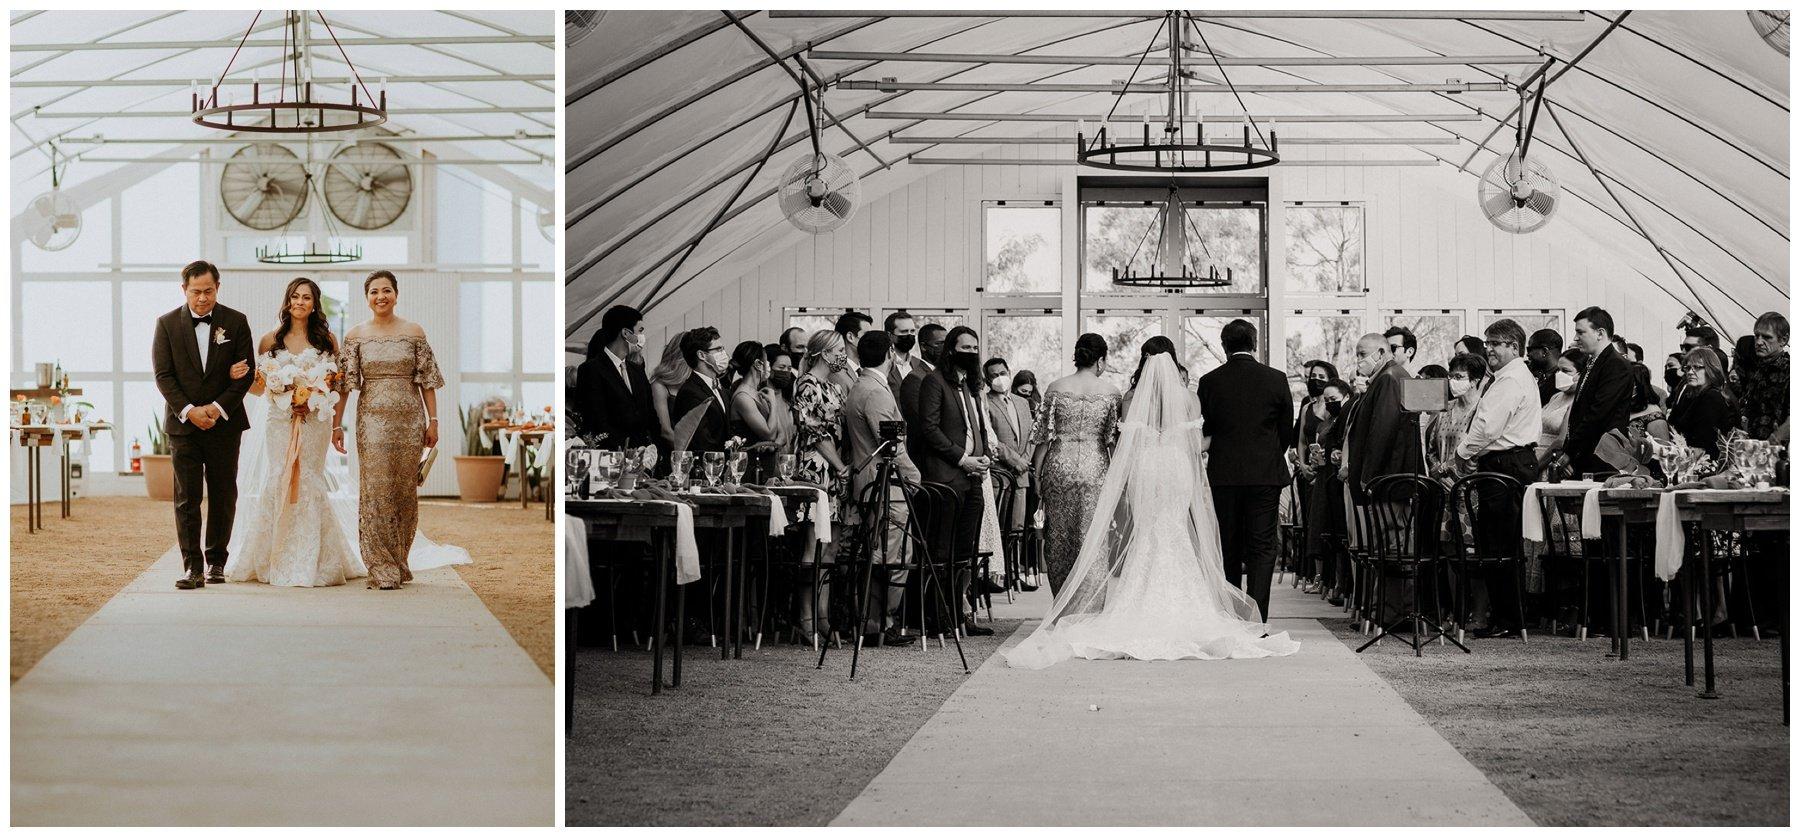 wedding ceremony at camino real ranch